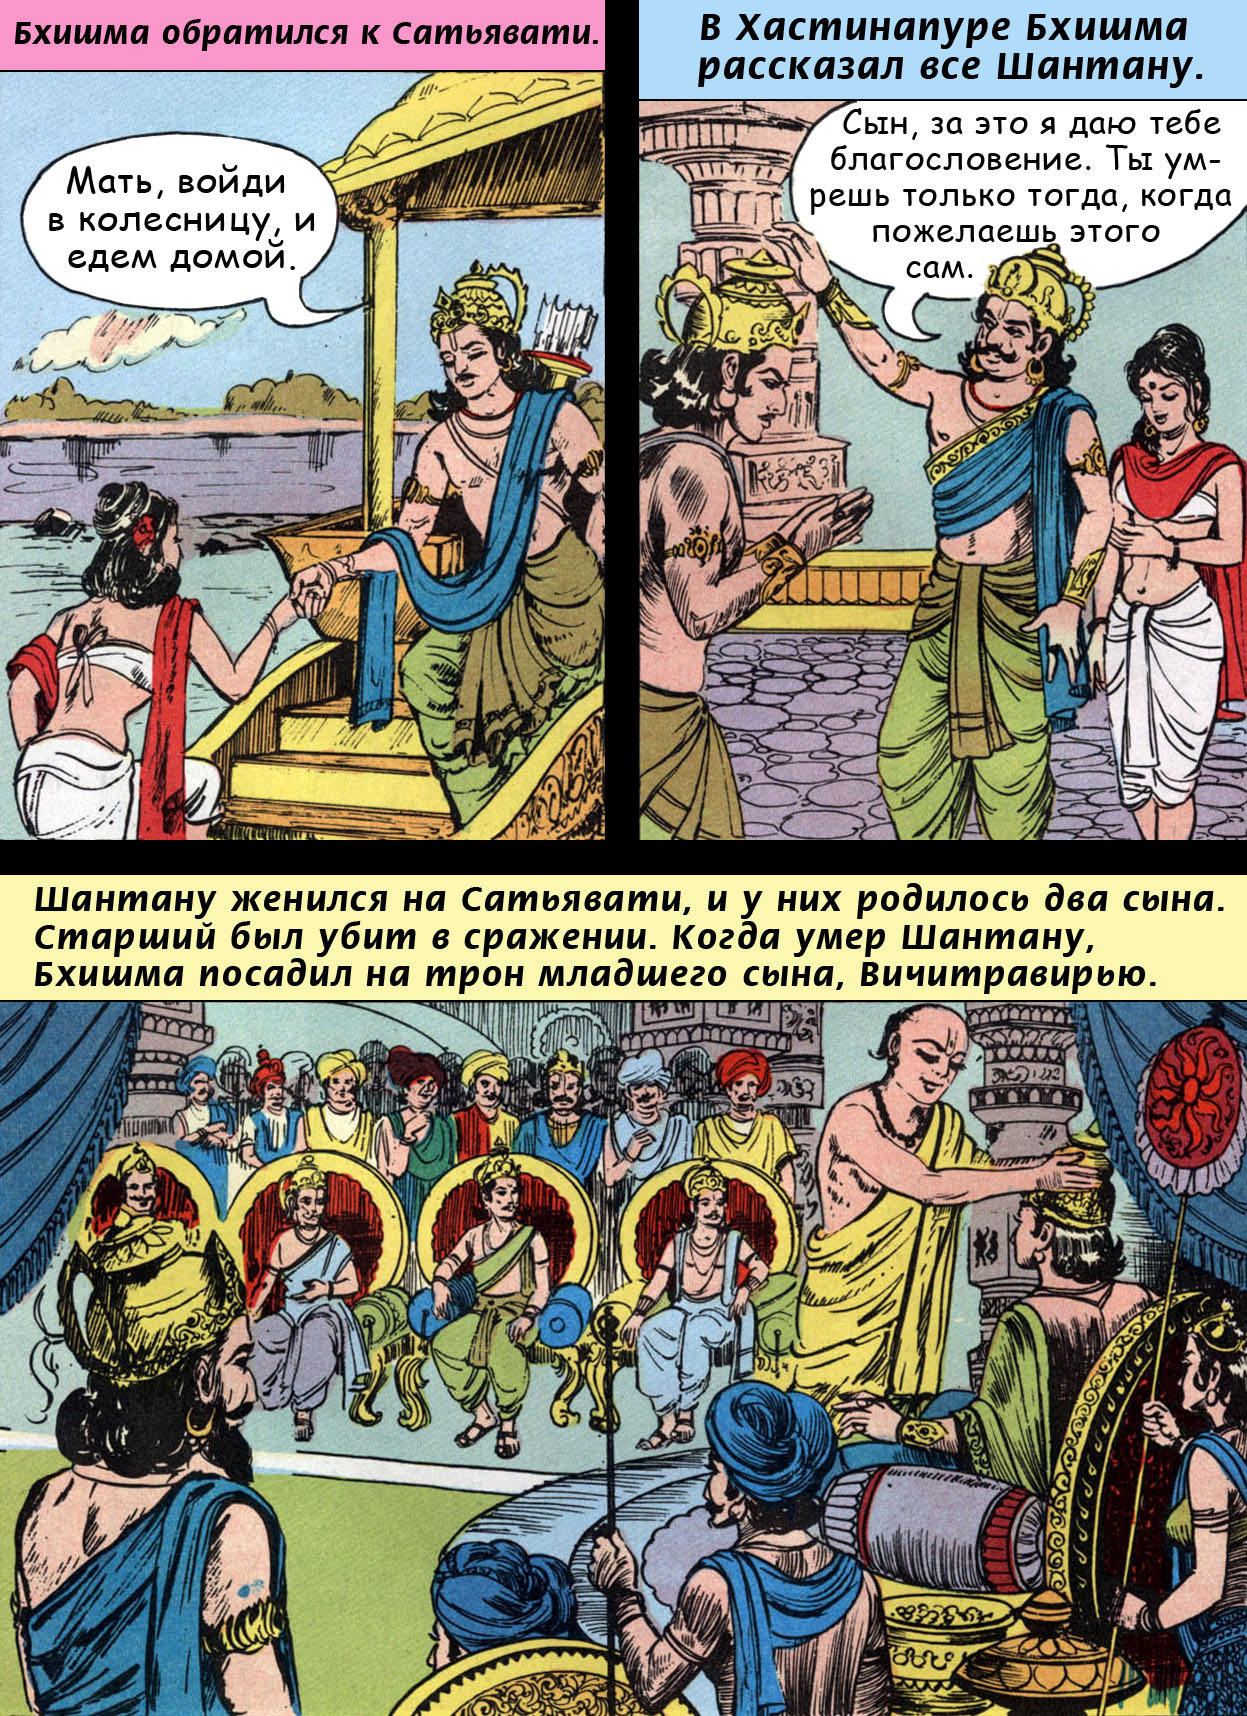 Бхишма 20 - ведический комикс